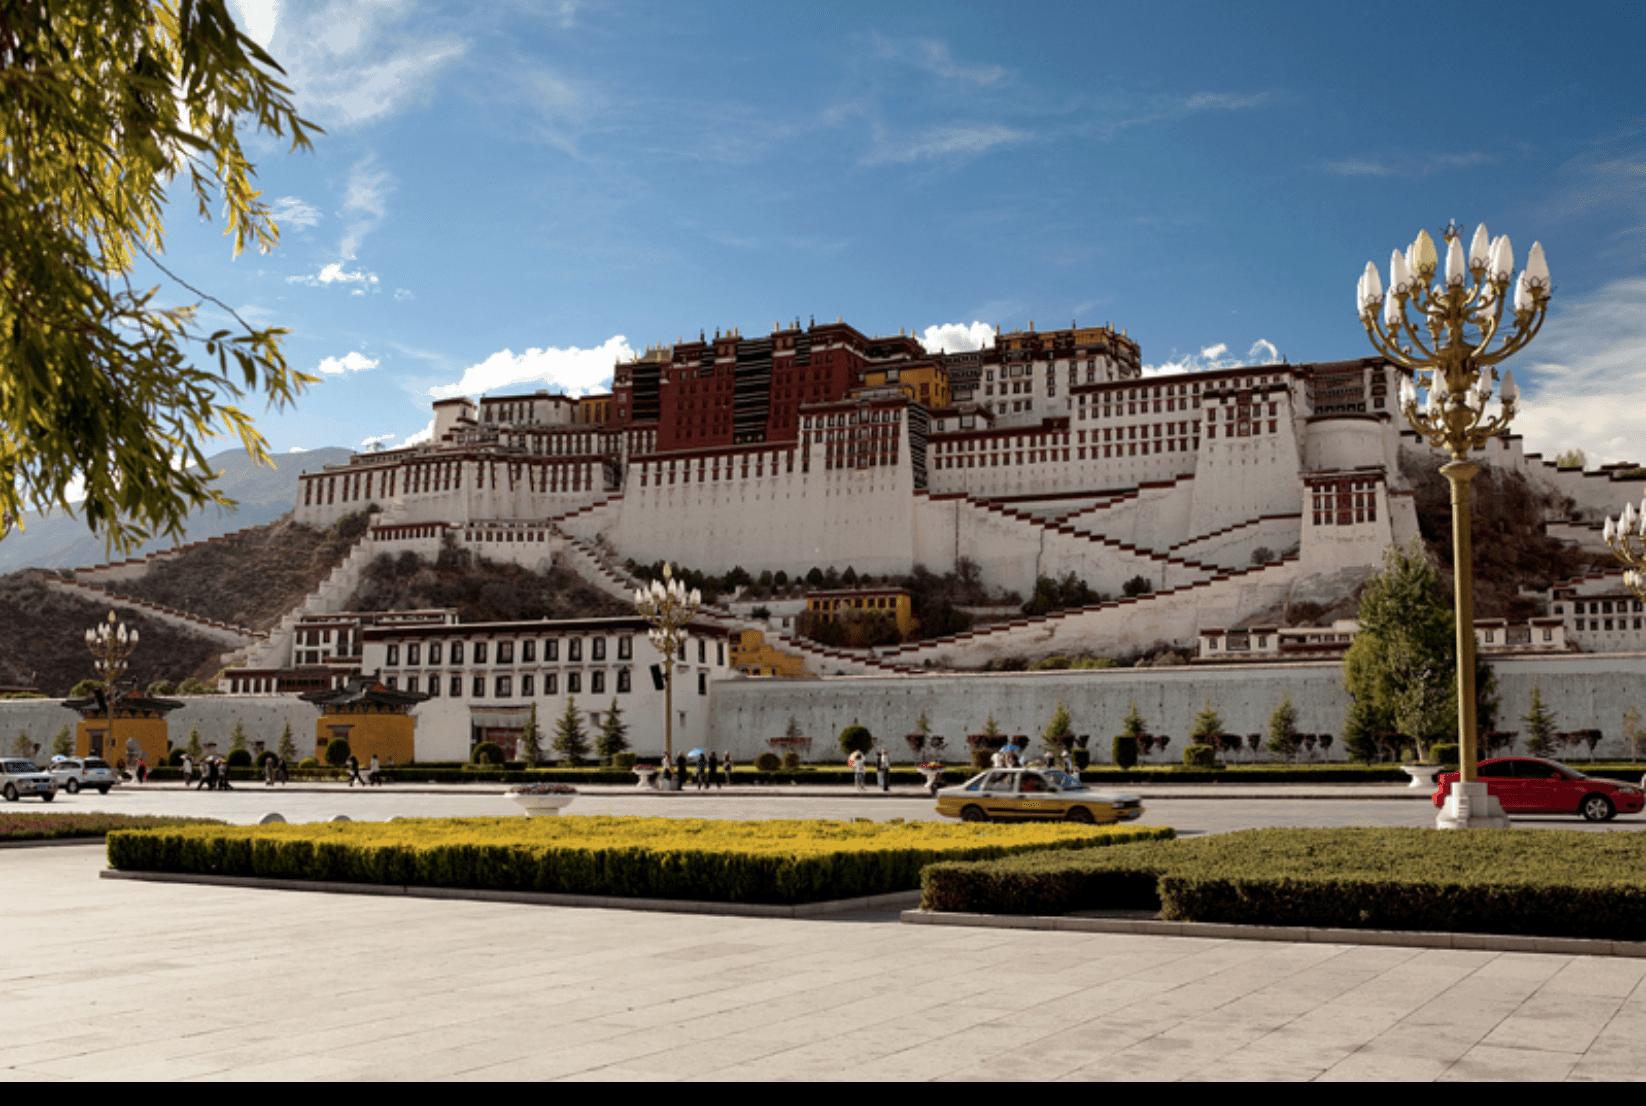 Tibet Lhasa Pothala